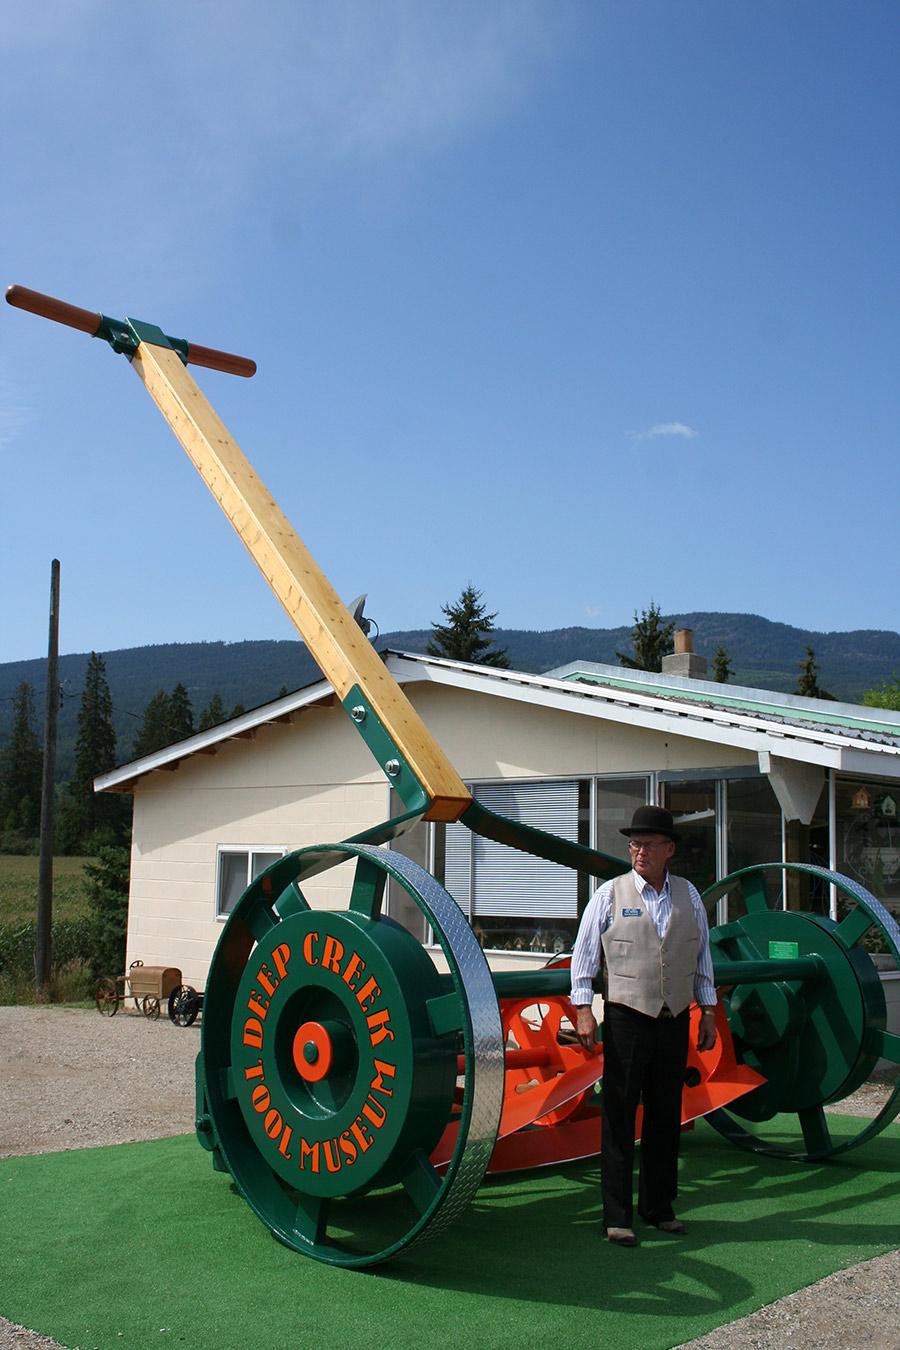 Deep Creek Tool Museum - Worlds Largest Lawnmower